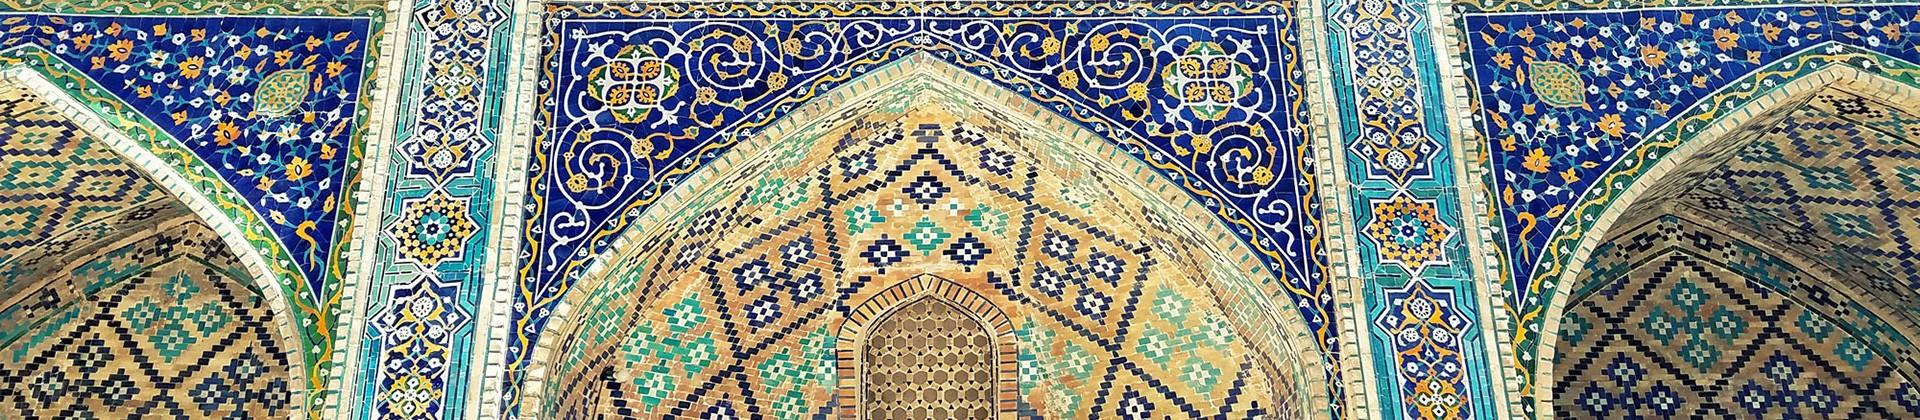 Divan-begi Madrasah - 1